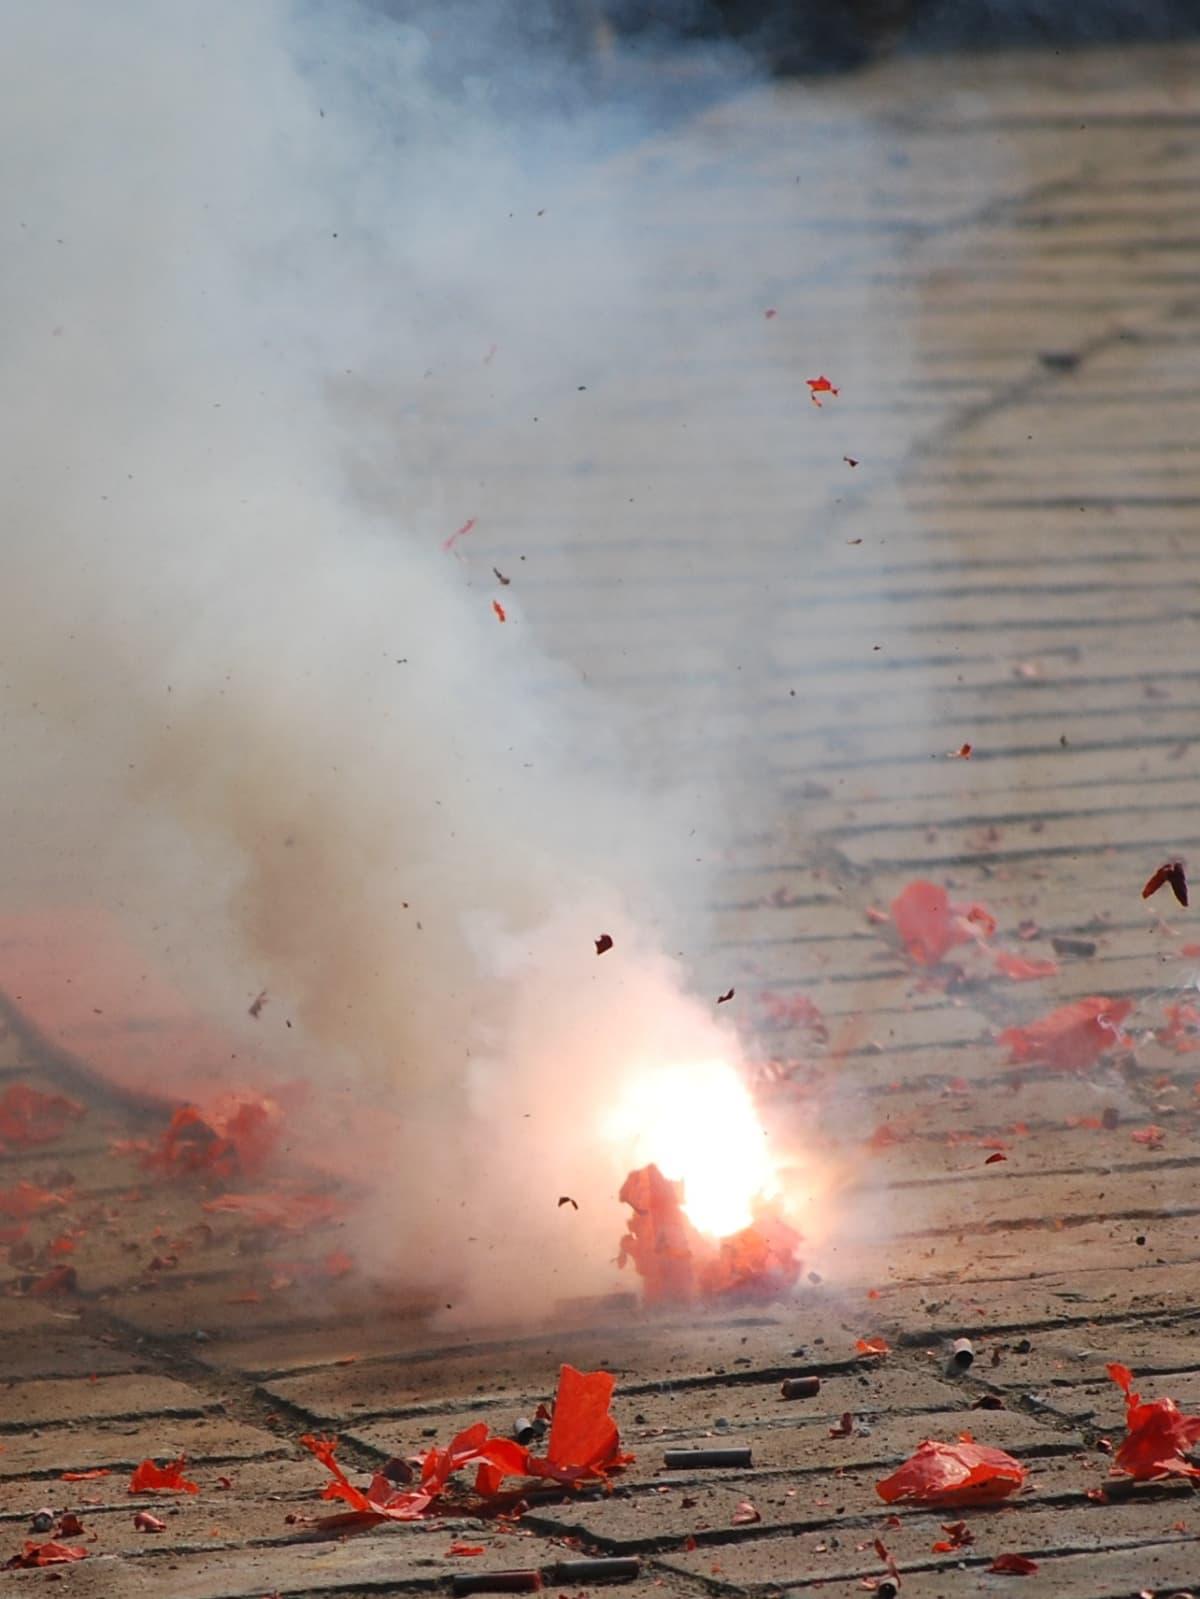 Smoking firecracker on the ground.